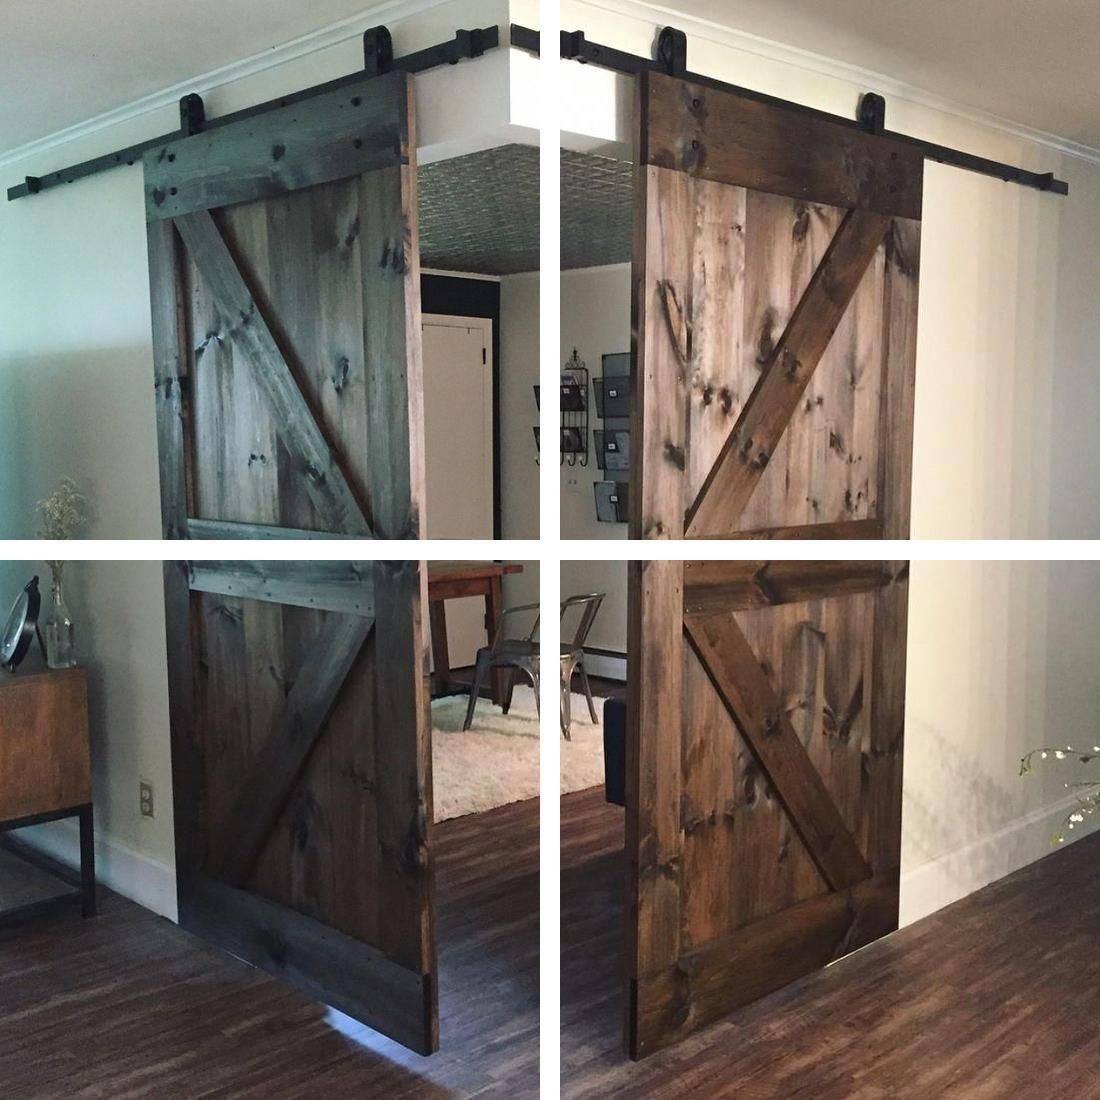 Old Barn Doors Indoor Barn Doors For Sale Modern Barn Door Hardware For Wood Door Farmhouse Style Bedrooms Barn Door Decor Farmhouse Interior